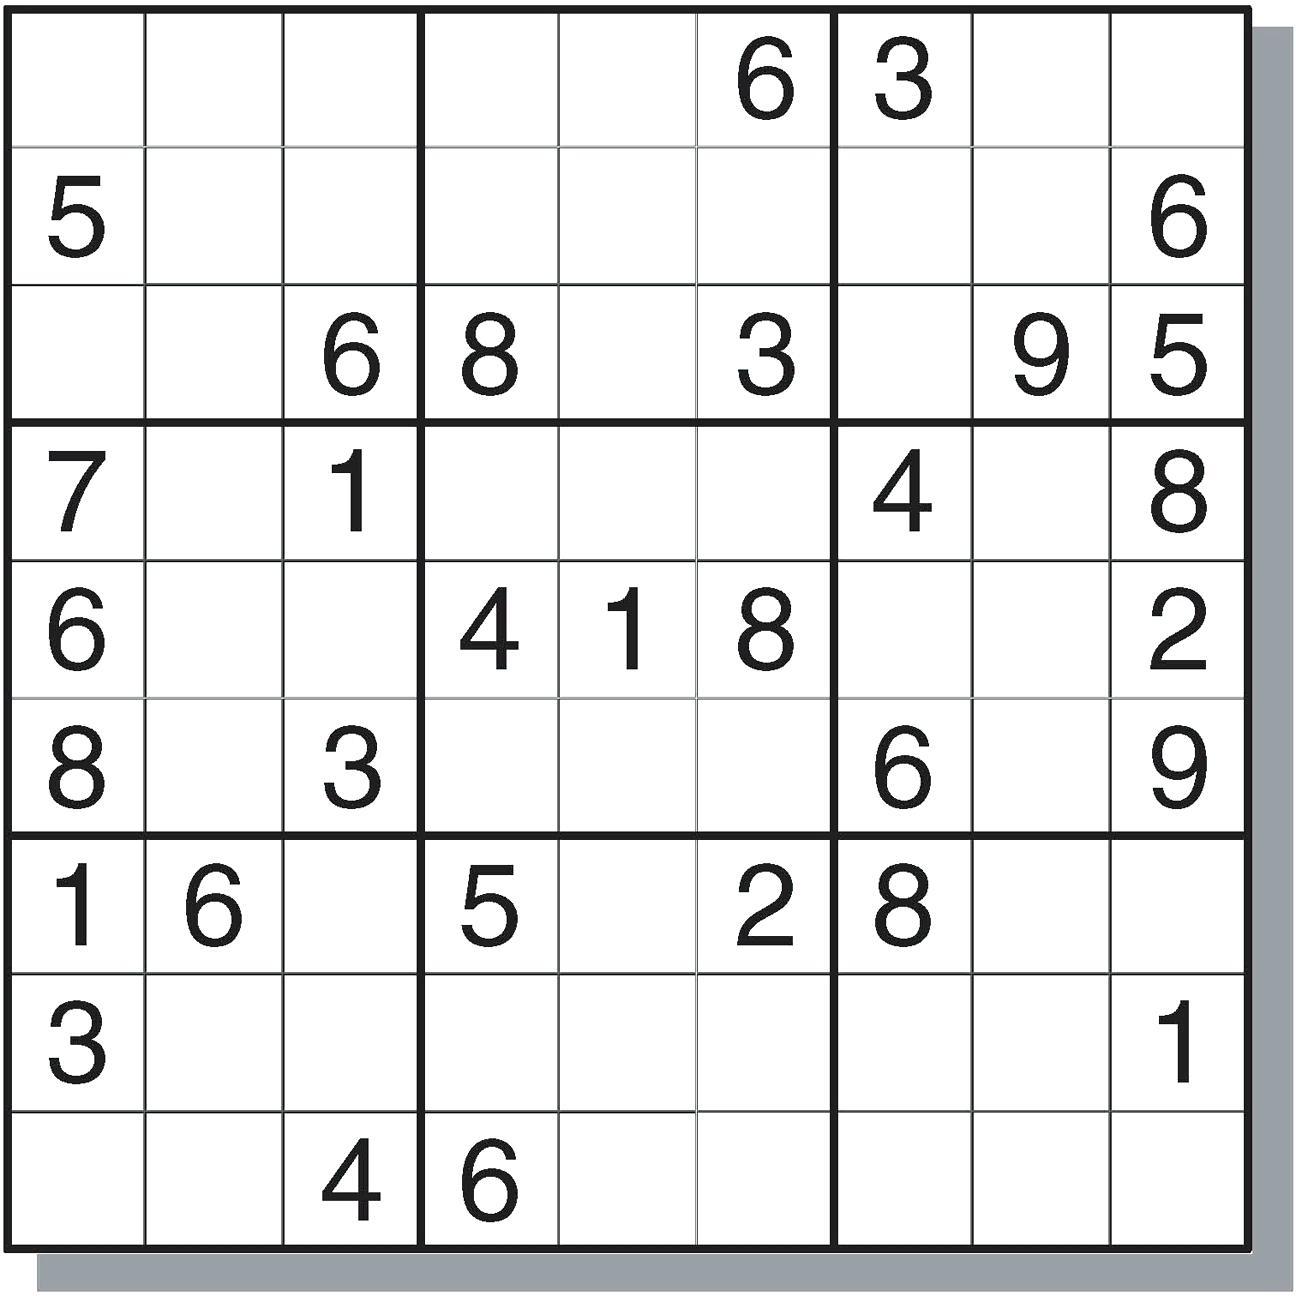 Sudoku Online - Ecosia - Sudoku 16X16 Printable Free